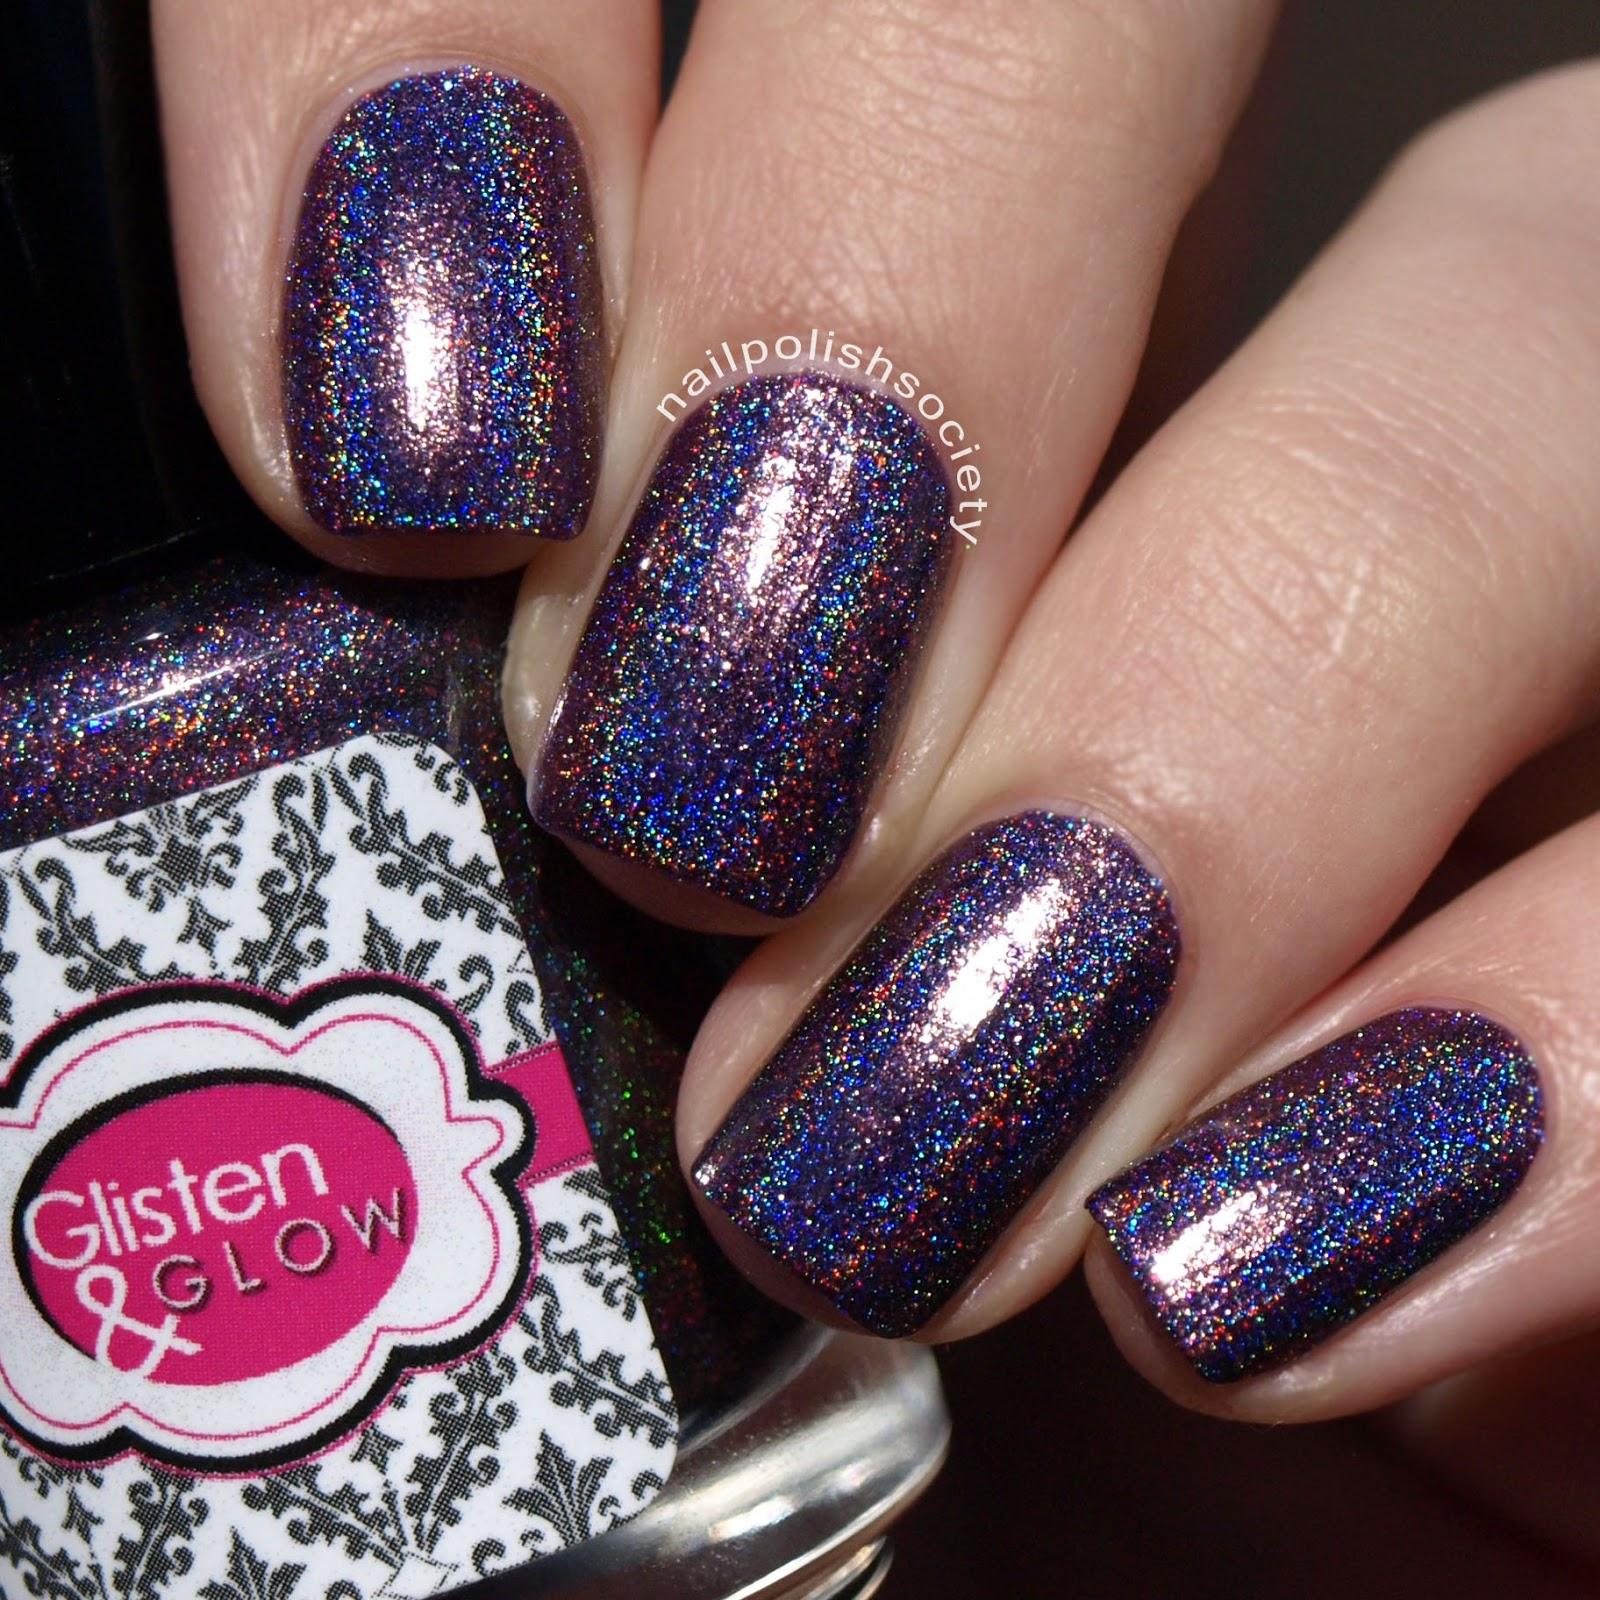 Nail Polish Society: Glisten and Glow Group Customs Budding Blossoms ...